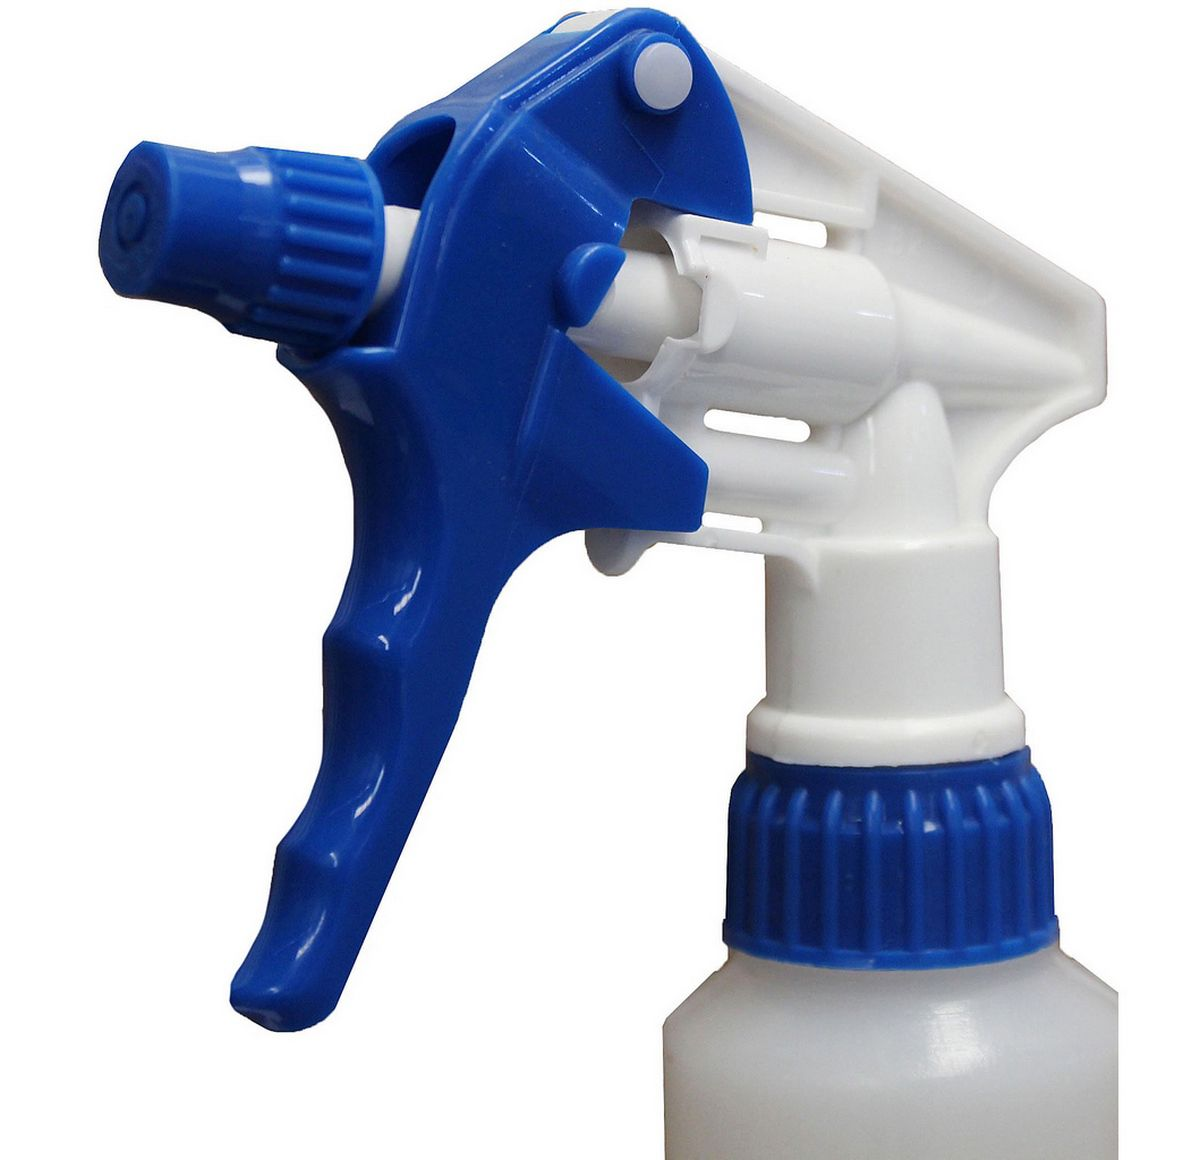 Kit Pulverizador Borrifador Manual 1 Litro Bico Gatilho Spray Azul Branco Perfect + Sabonete Líquido 1 Litro Antisséptic